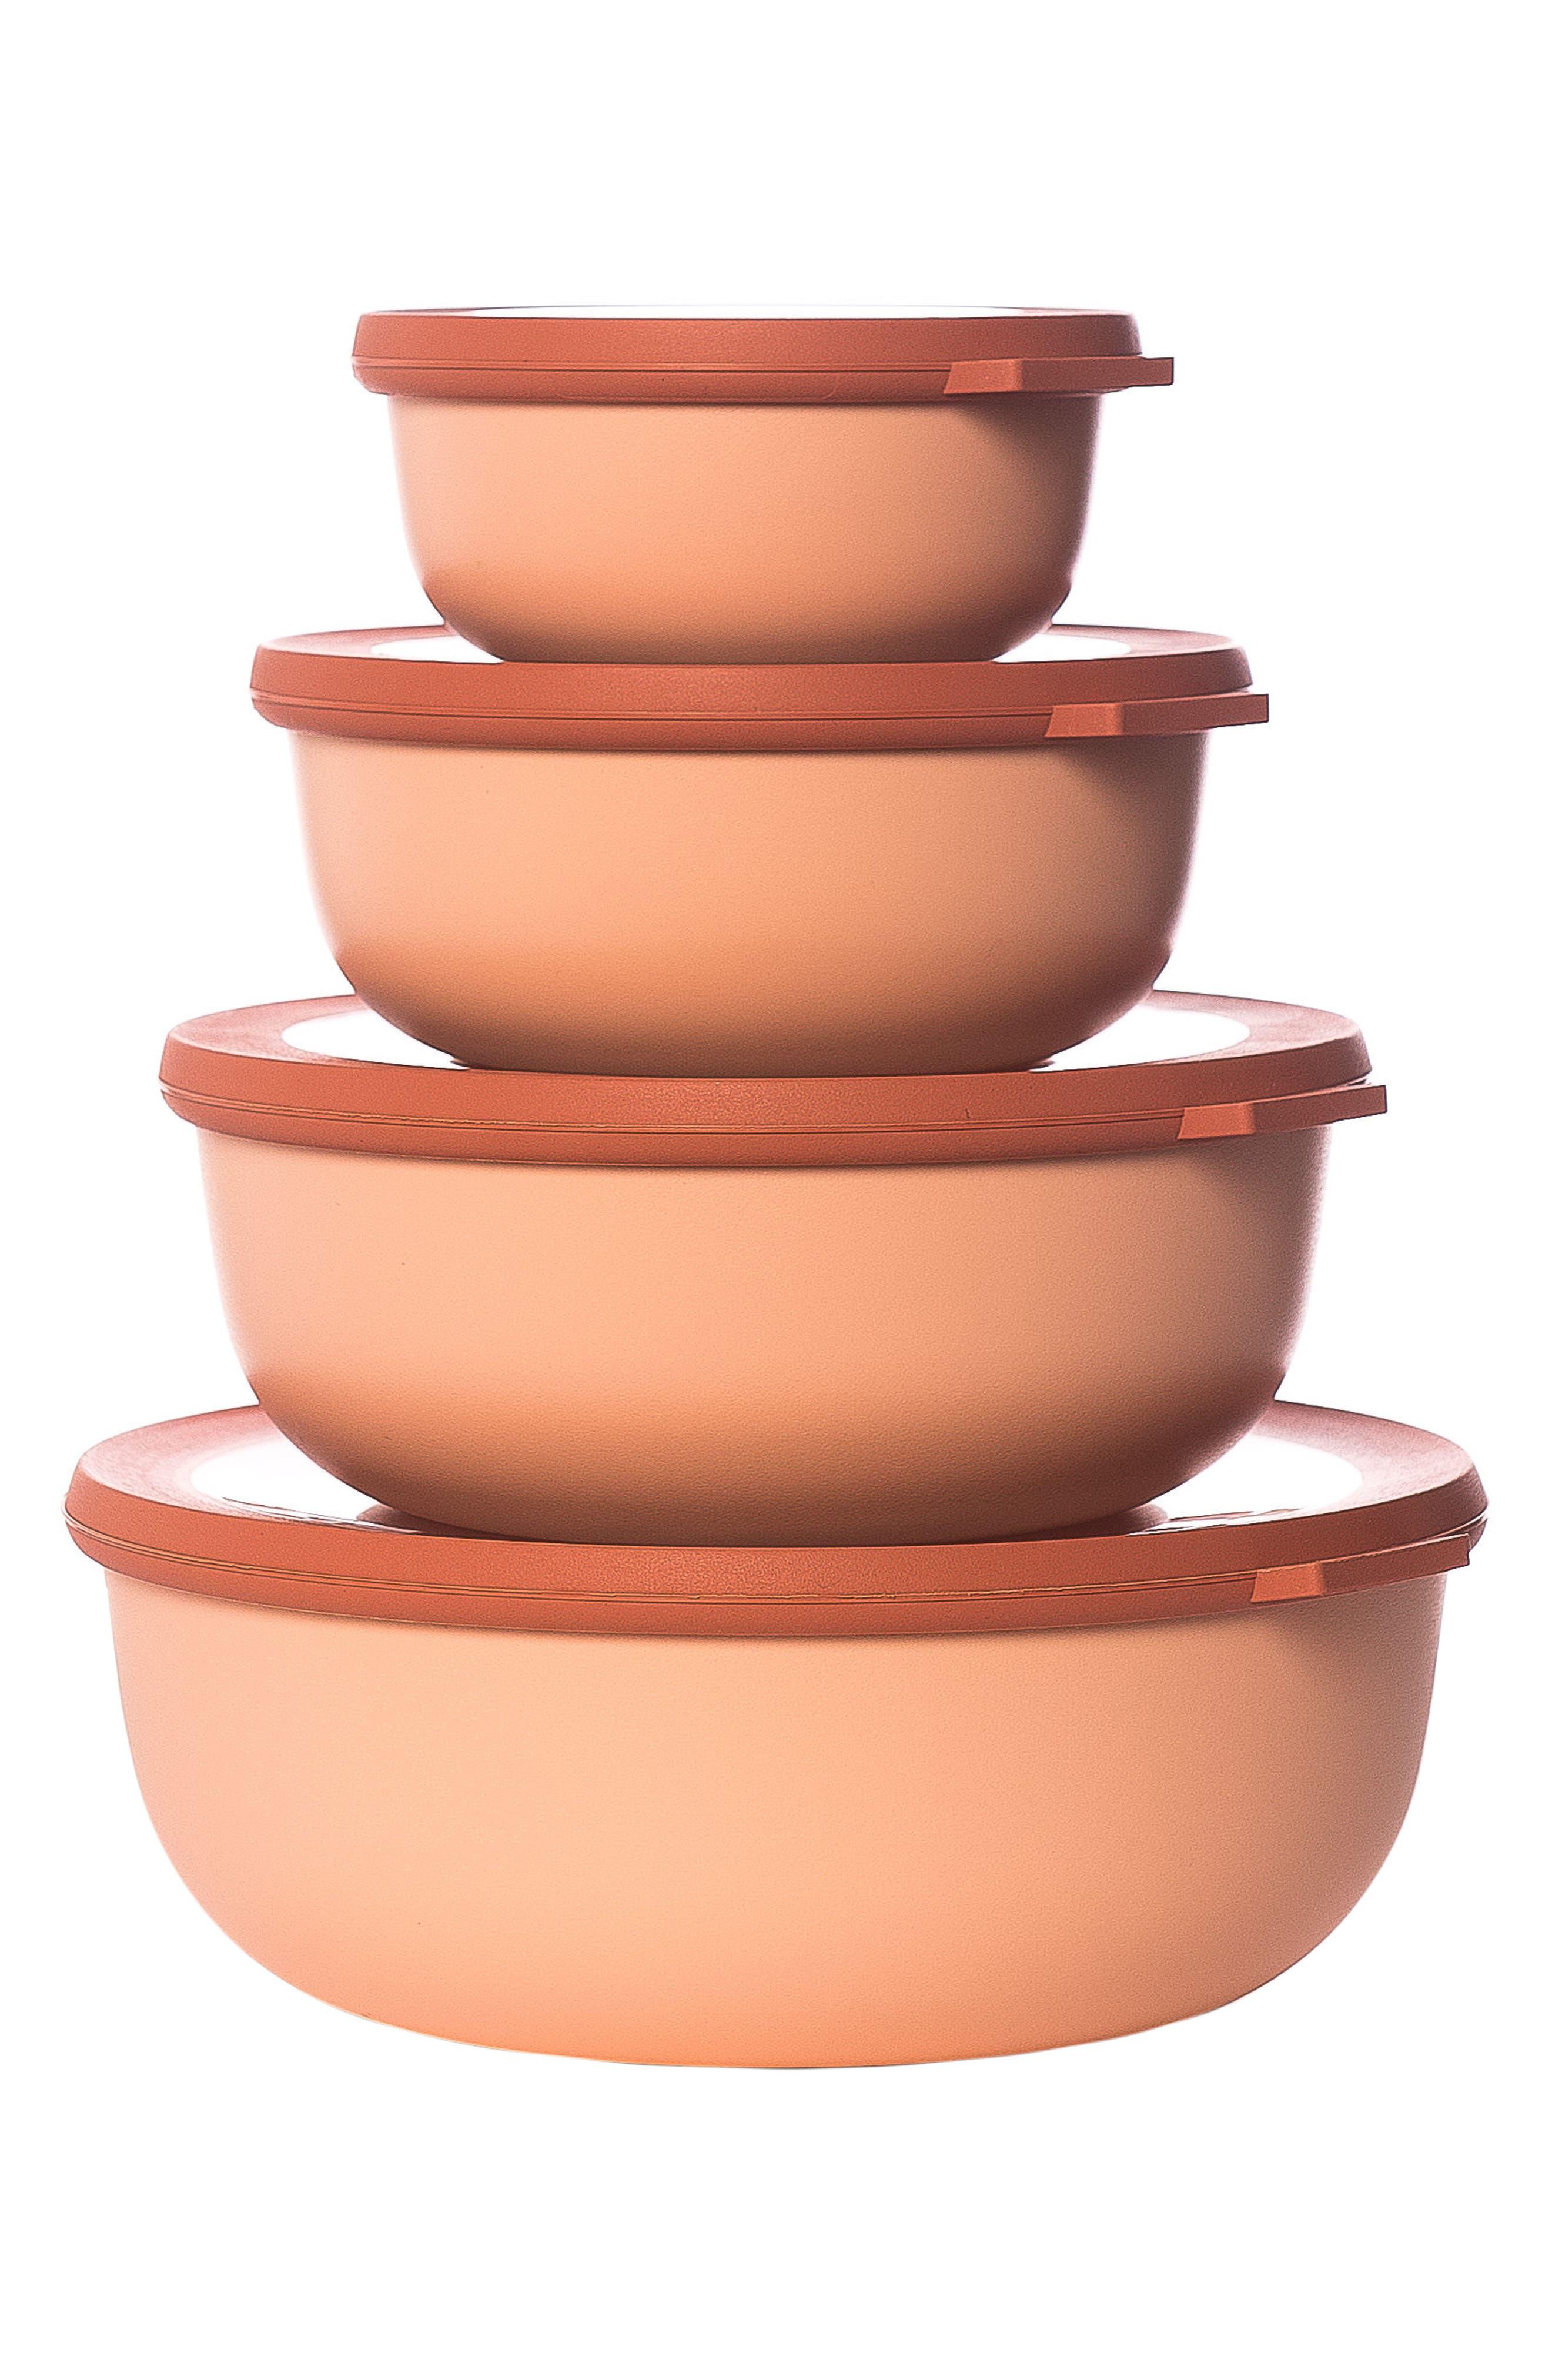 Main Image - Rosti Mepal Cirqula Set of 4 Storage Bowls